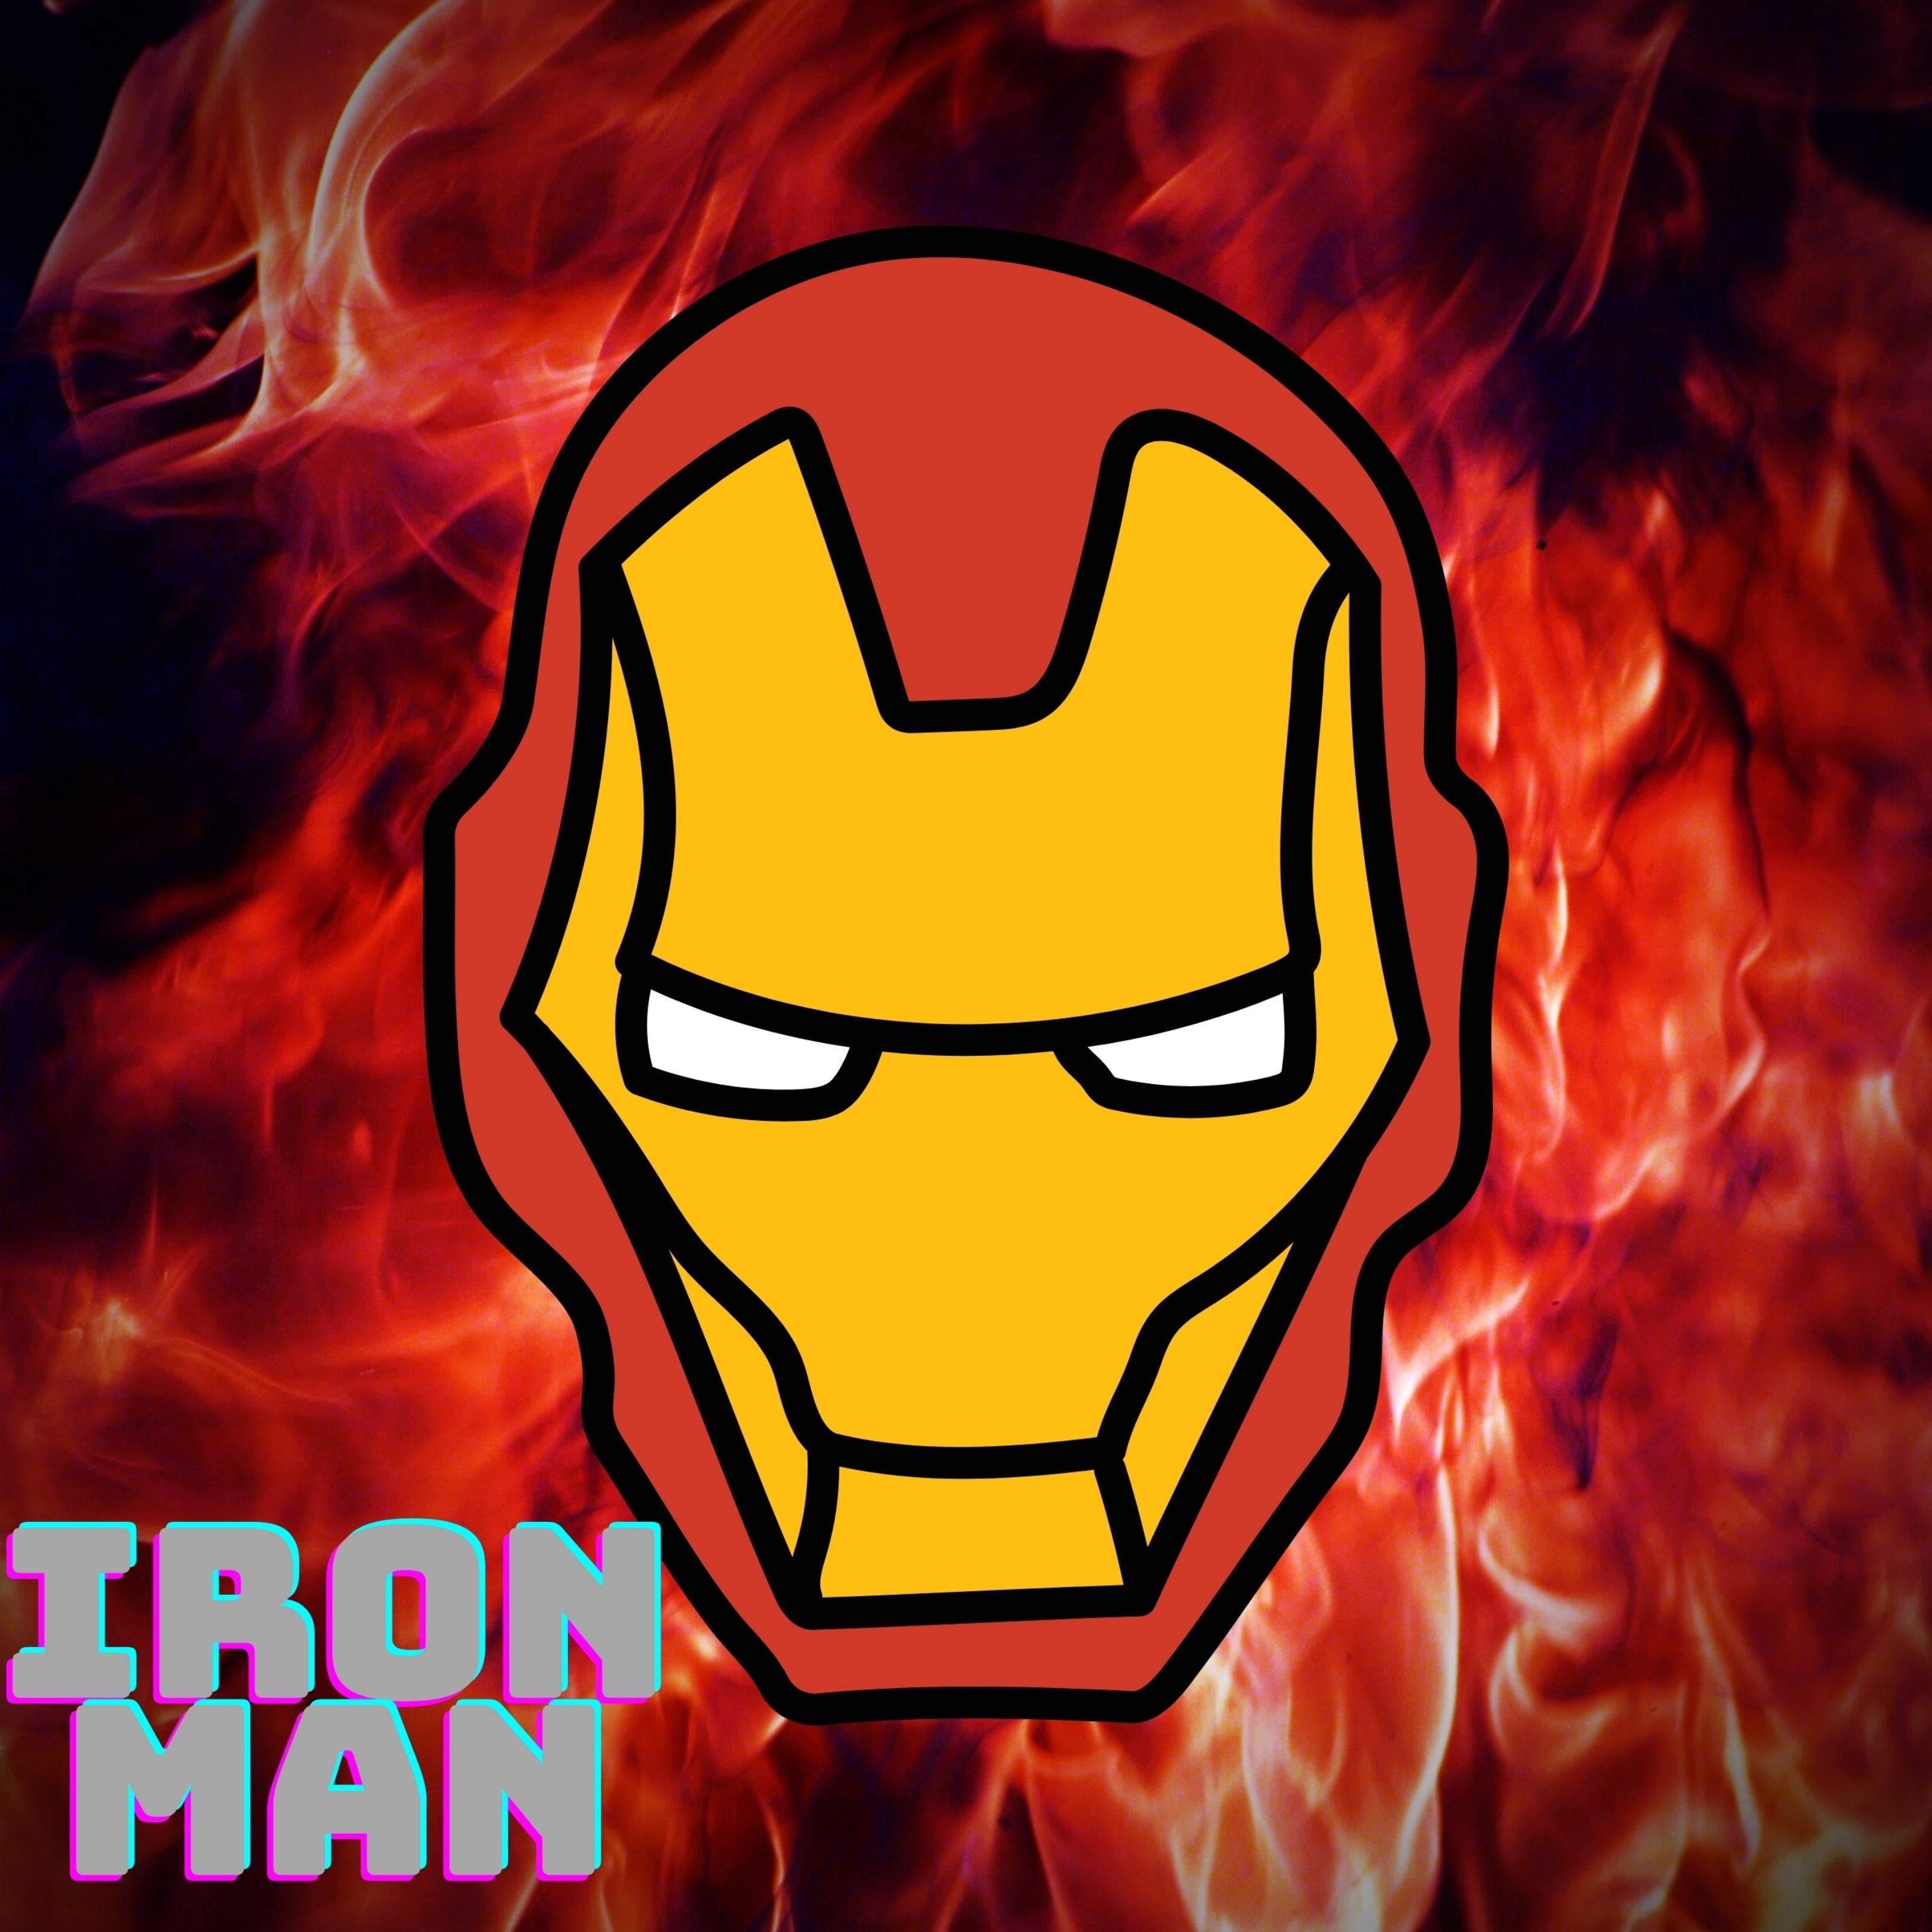 Iron Man Fire Background iPad Wallpaper